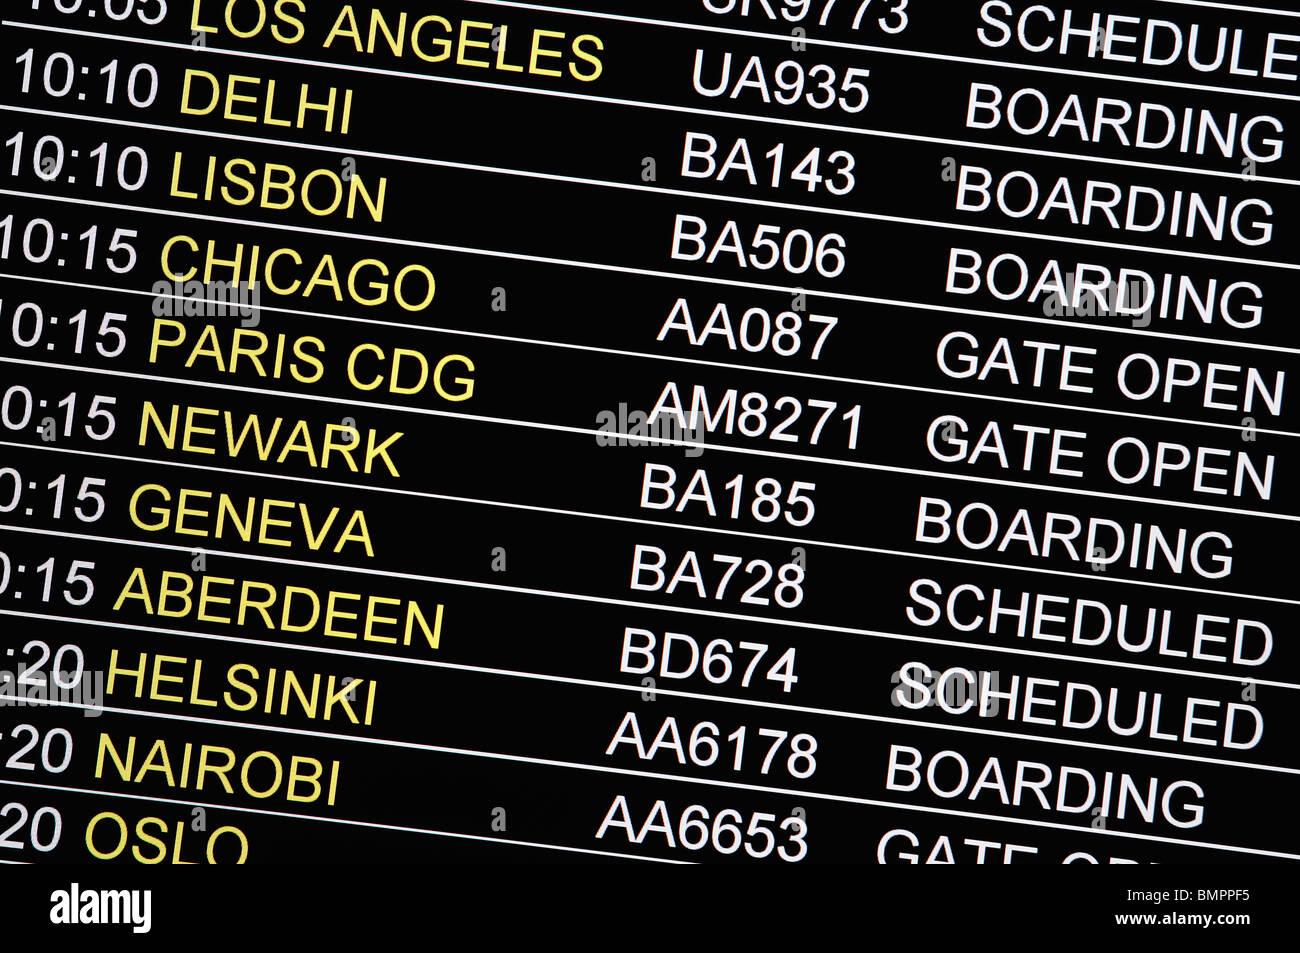 Flight Board at Heathrow Airport UK - Stock Image